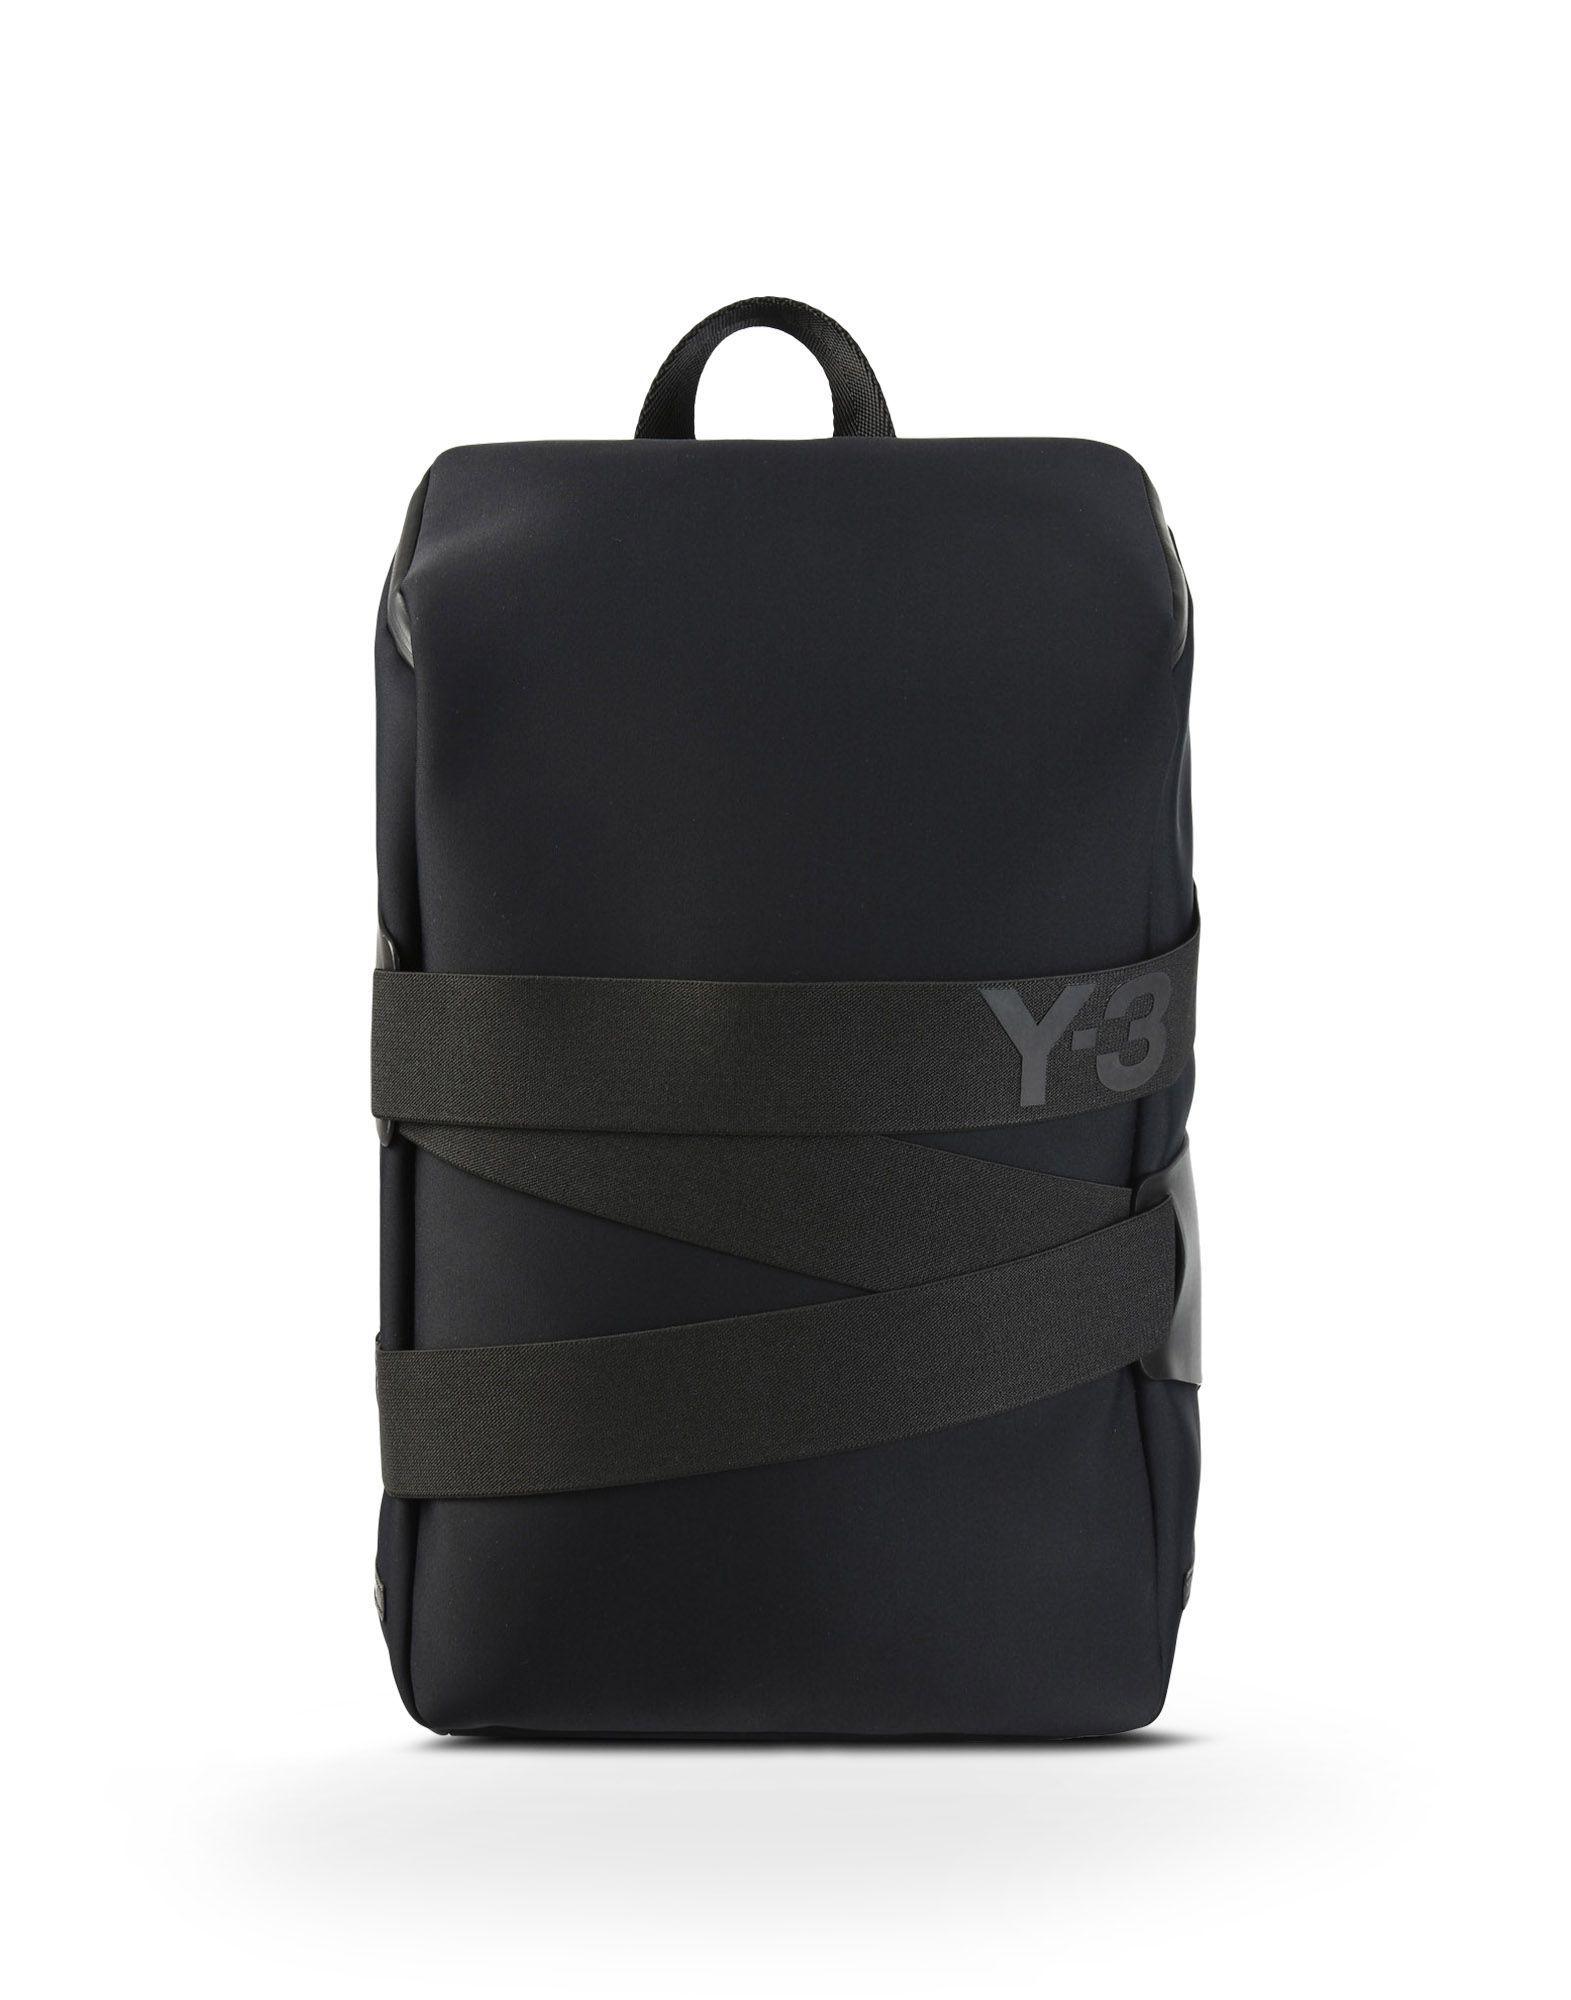 e42833592e84 Adidas - Y-3 QRUSH BACKPACK SMALL BAGS - black unisex Yohji Yamamoto